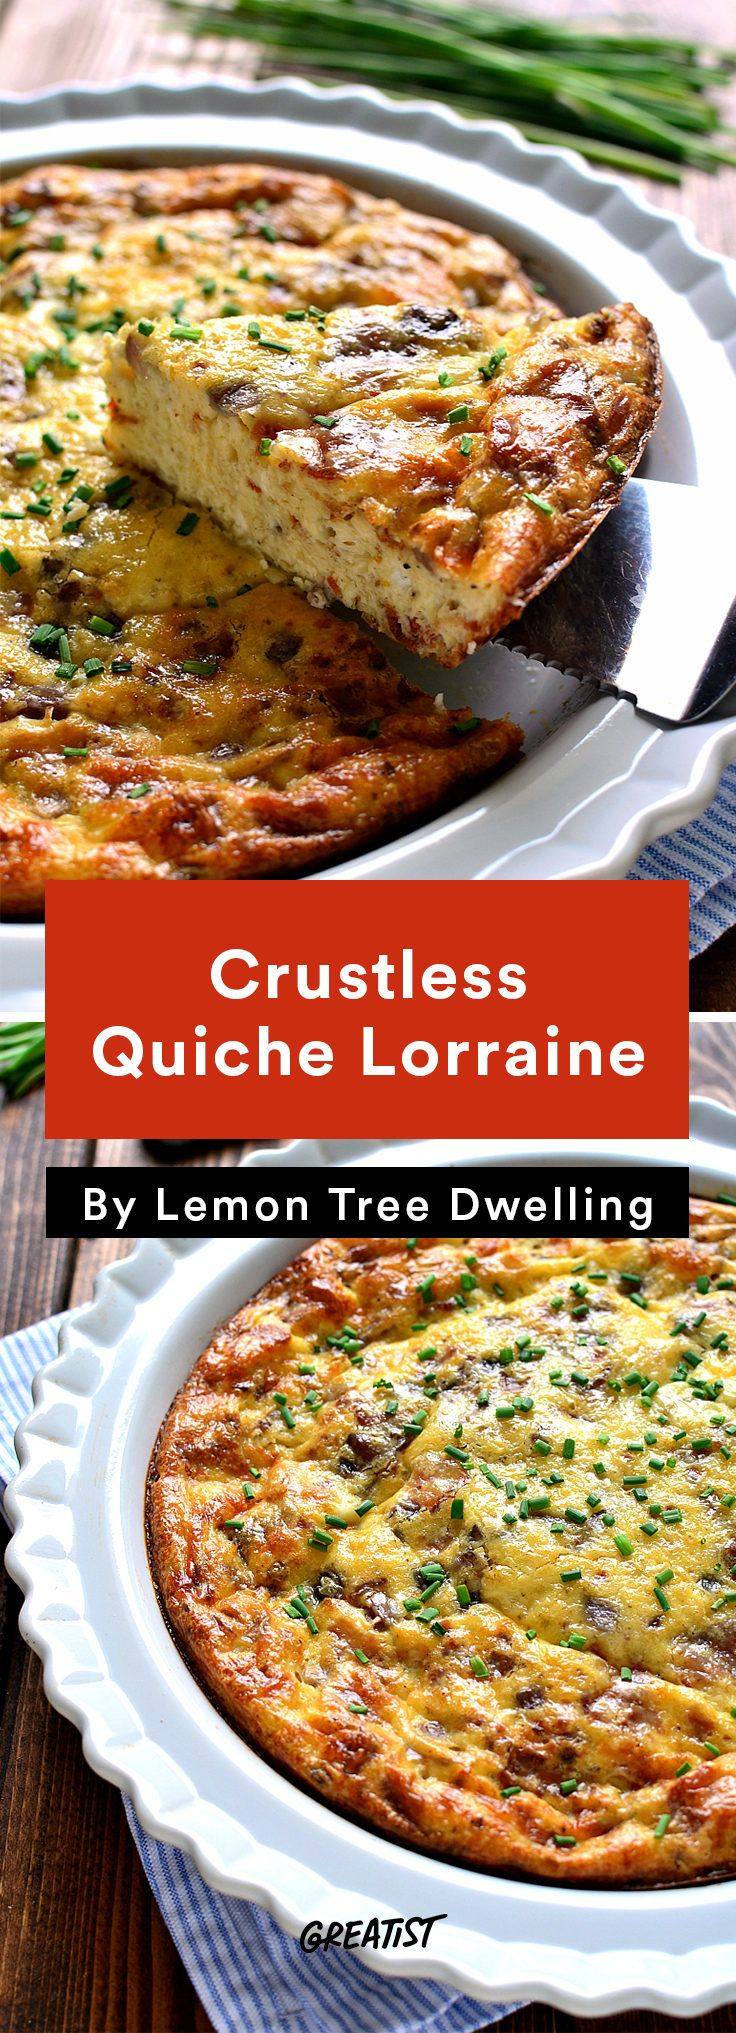 Crustless Quiche Lorraine Recipe